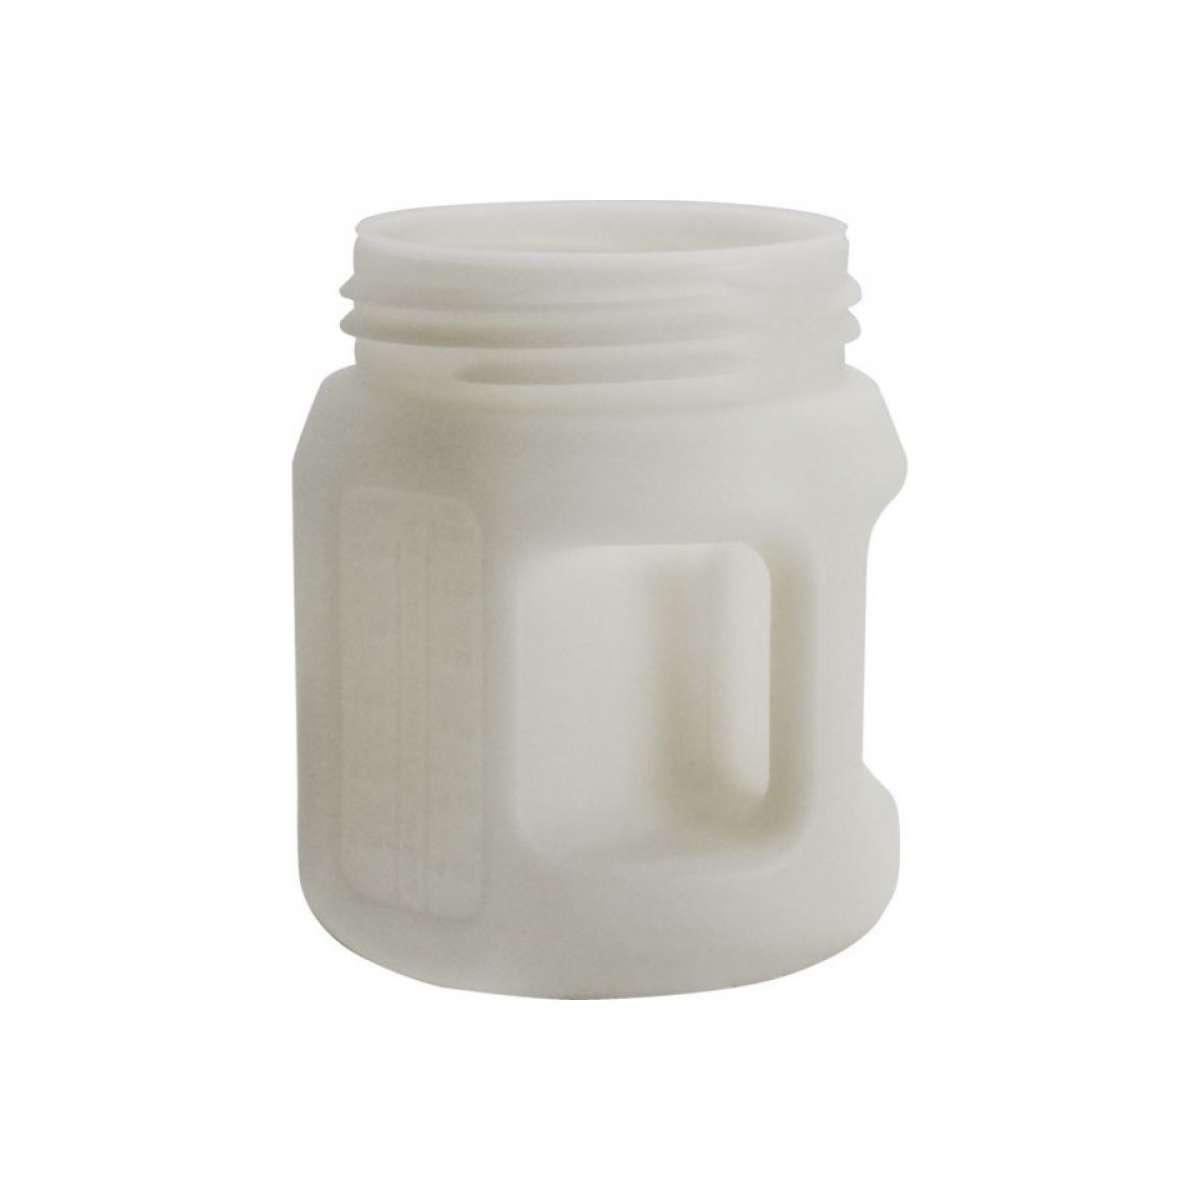 1.5 Litre (1.5 Quart) Drum